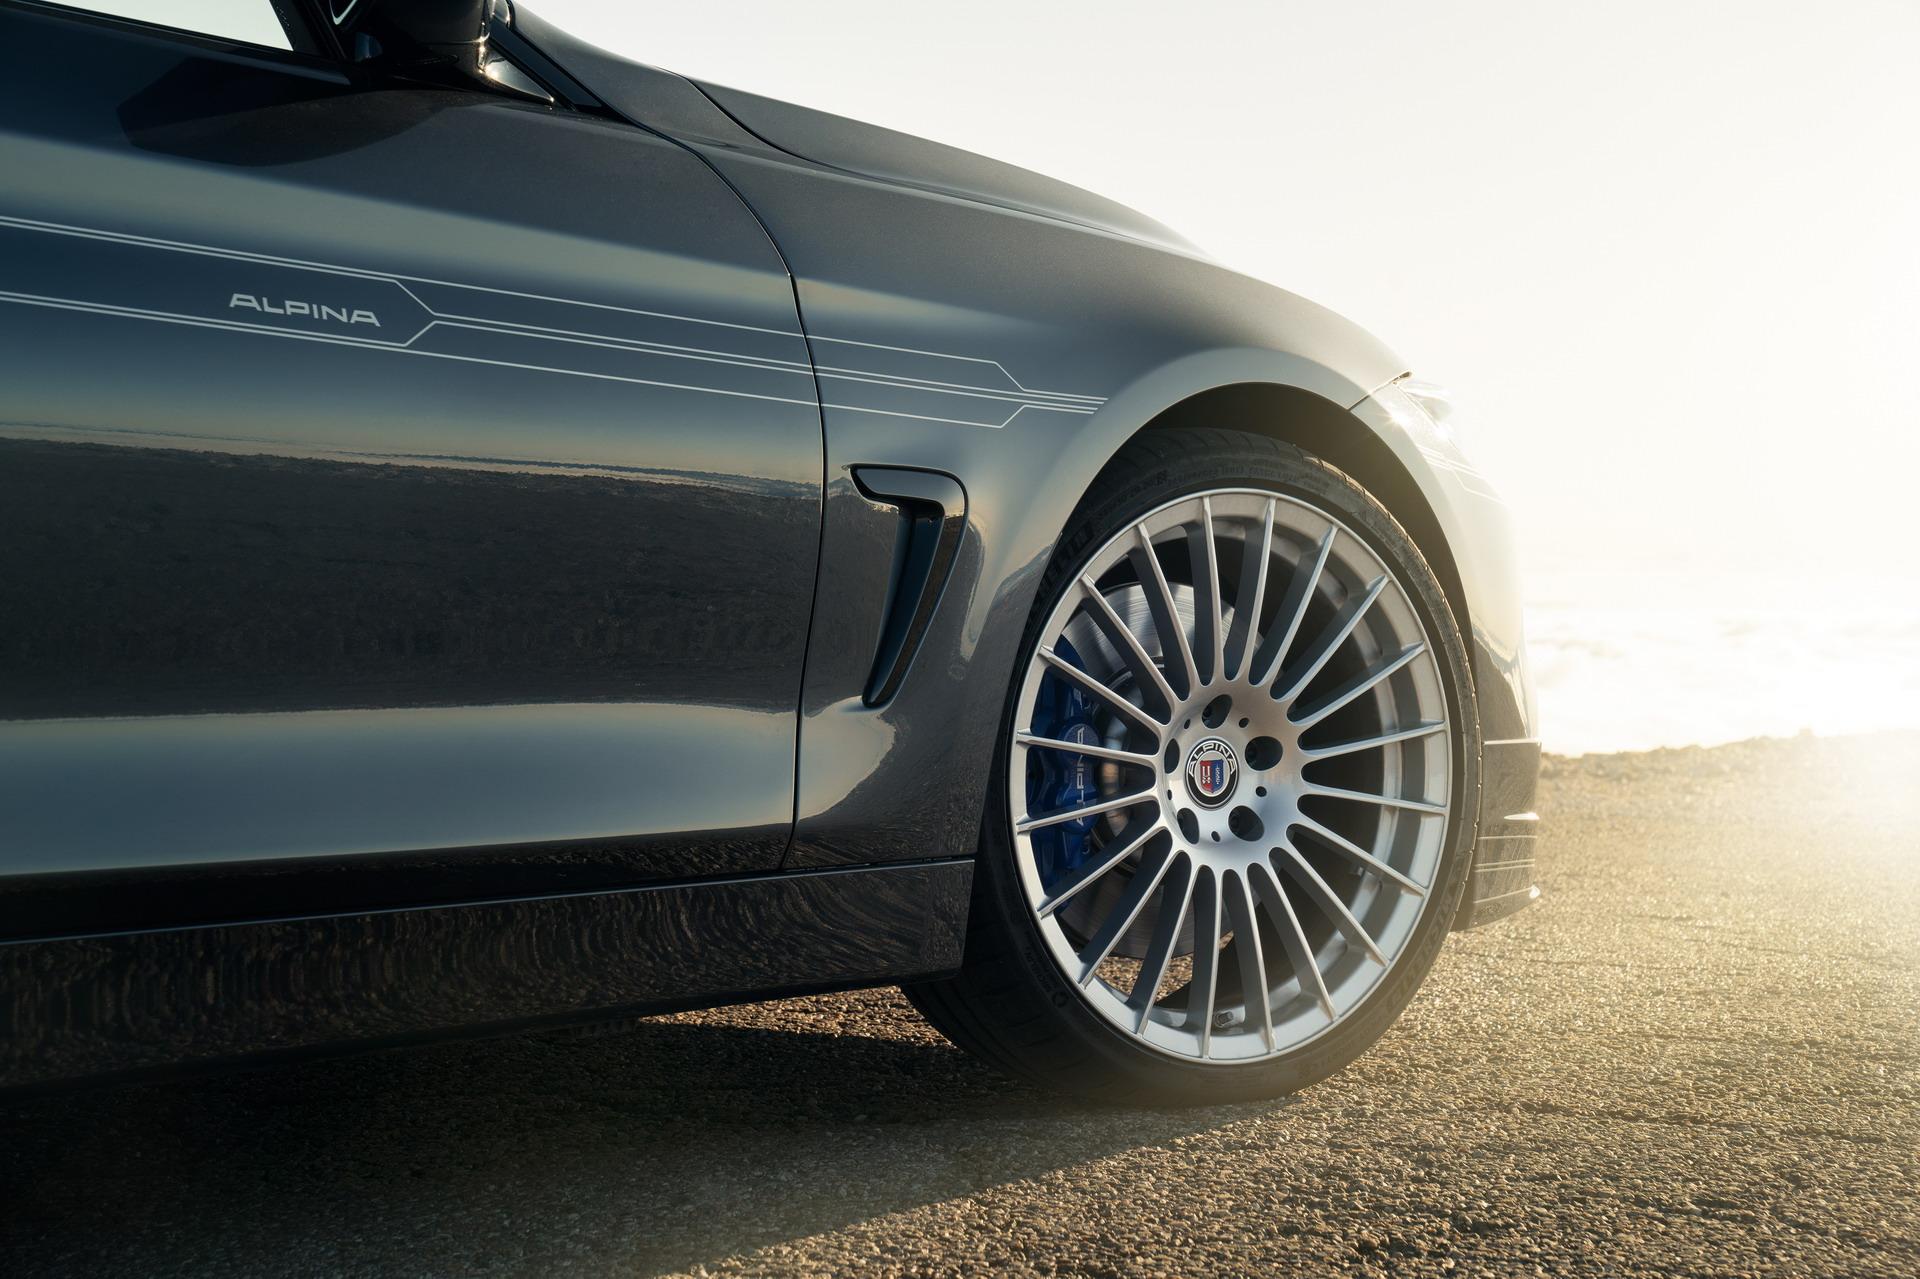 The principle of 20 spokes : History of the ALPINA wheel design -  PistonLeaks